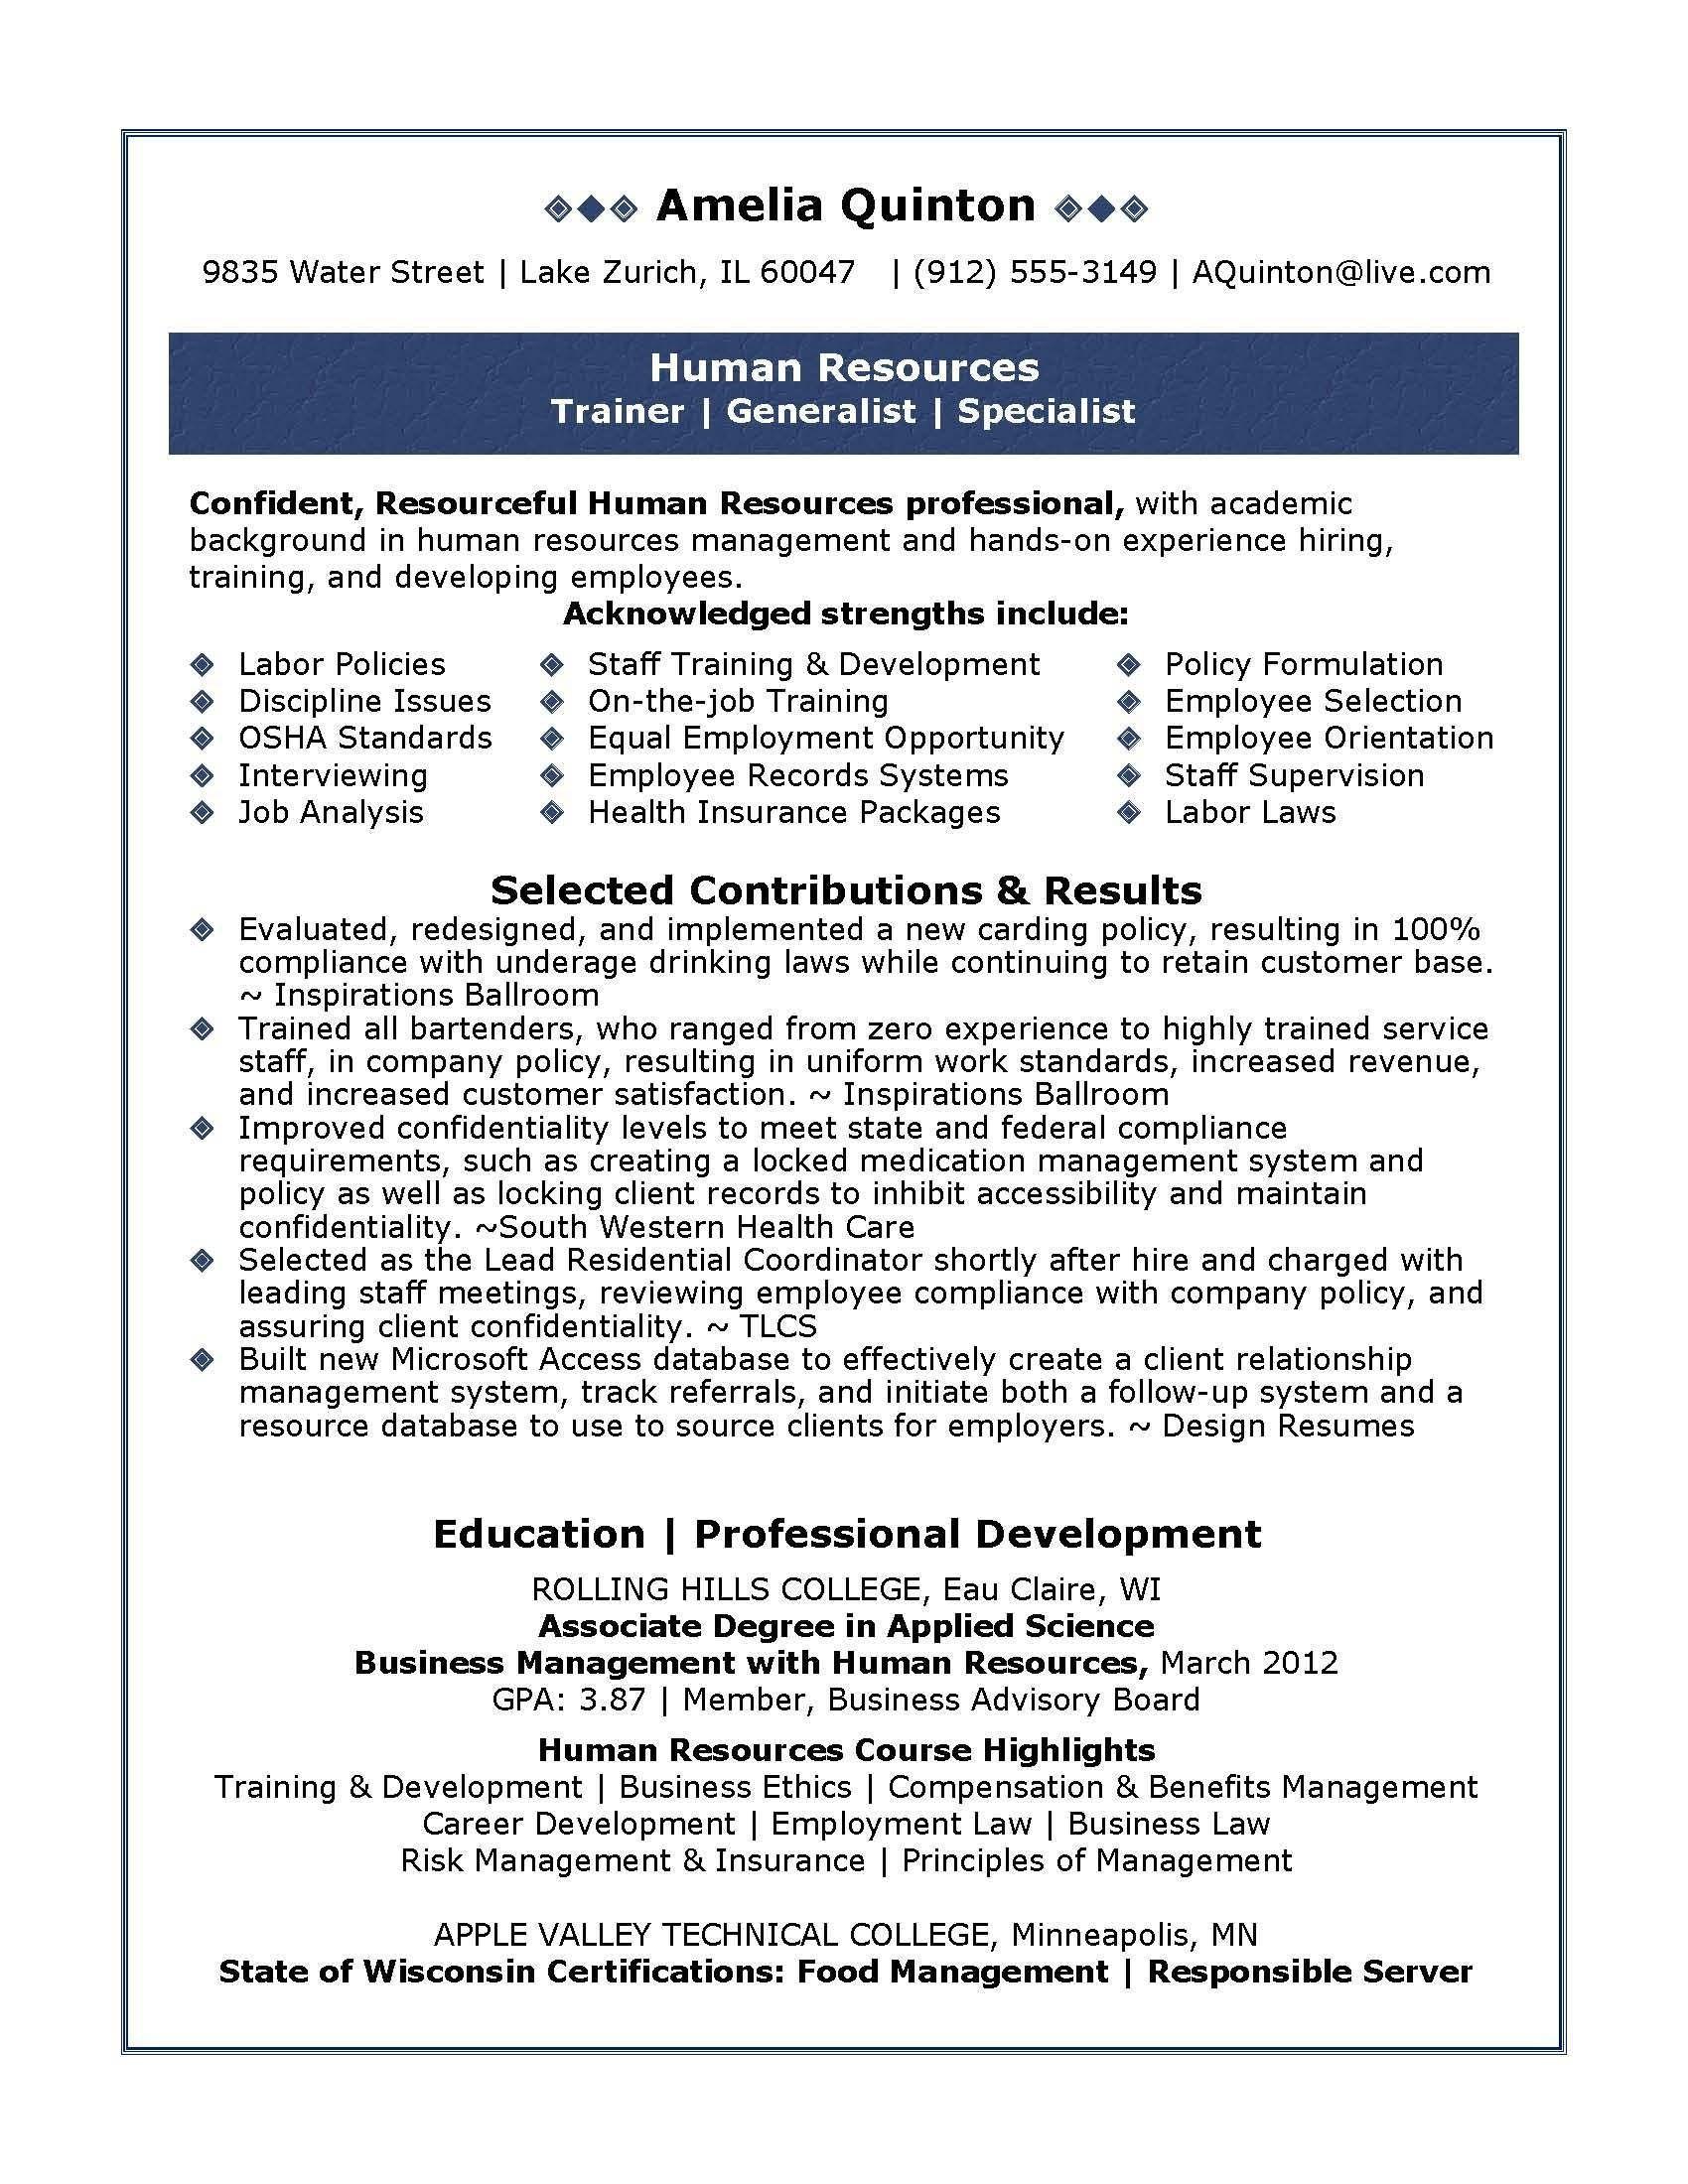 Business Opportunity Assessment Template New Application Letter Regarding Business Opportunity Assessment Template